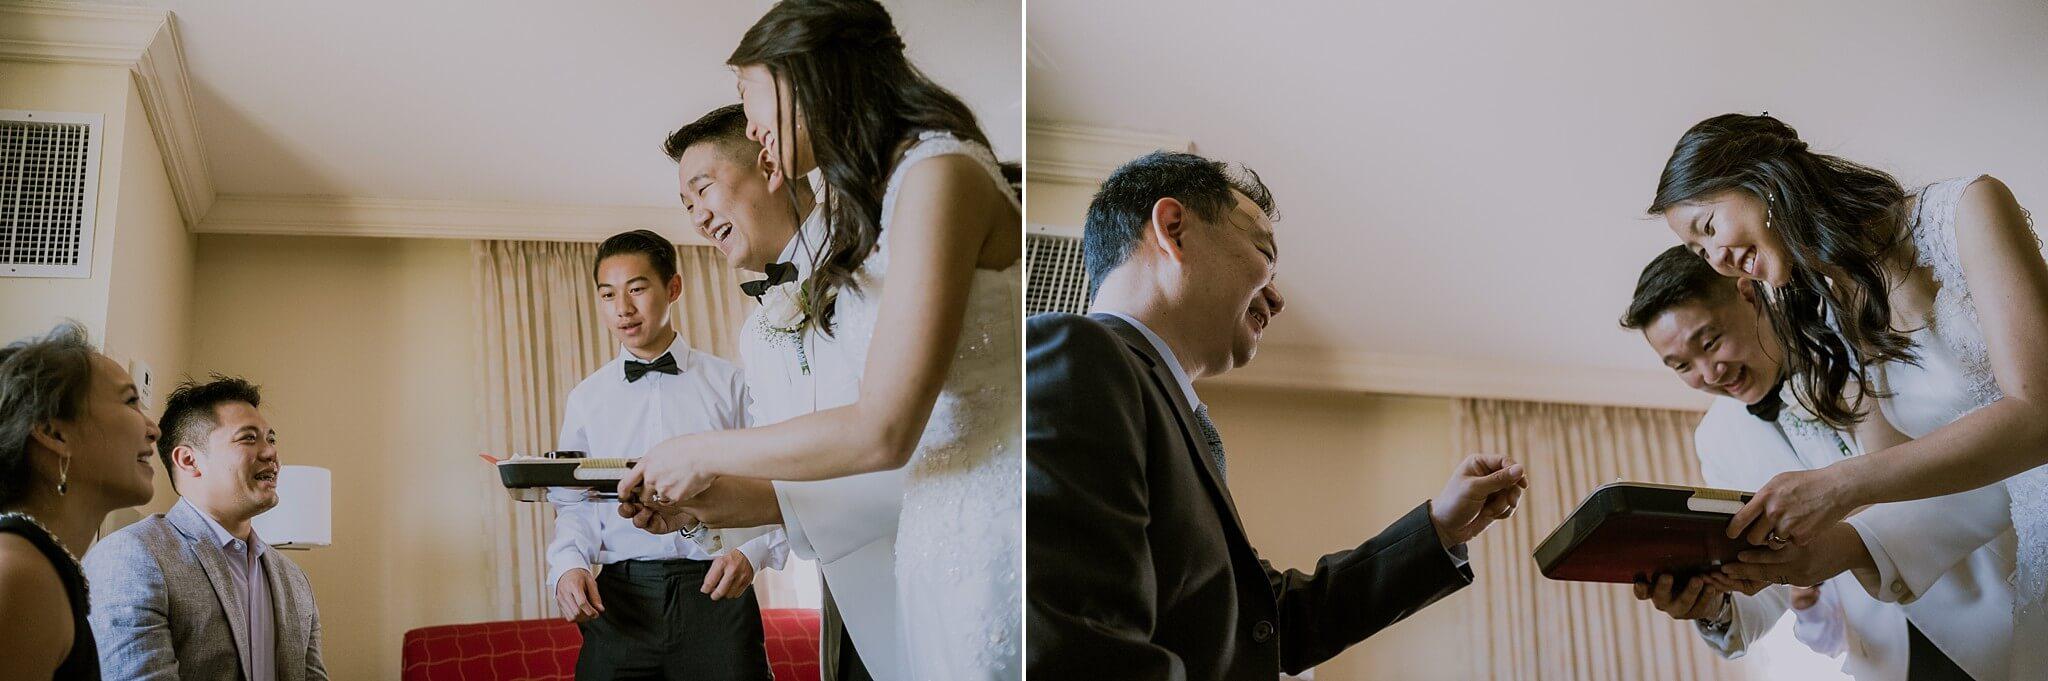 DoubleTree Hotel Wedding Photos